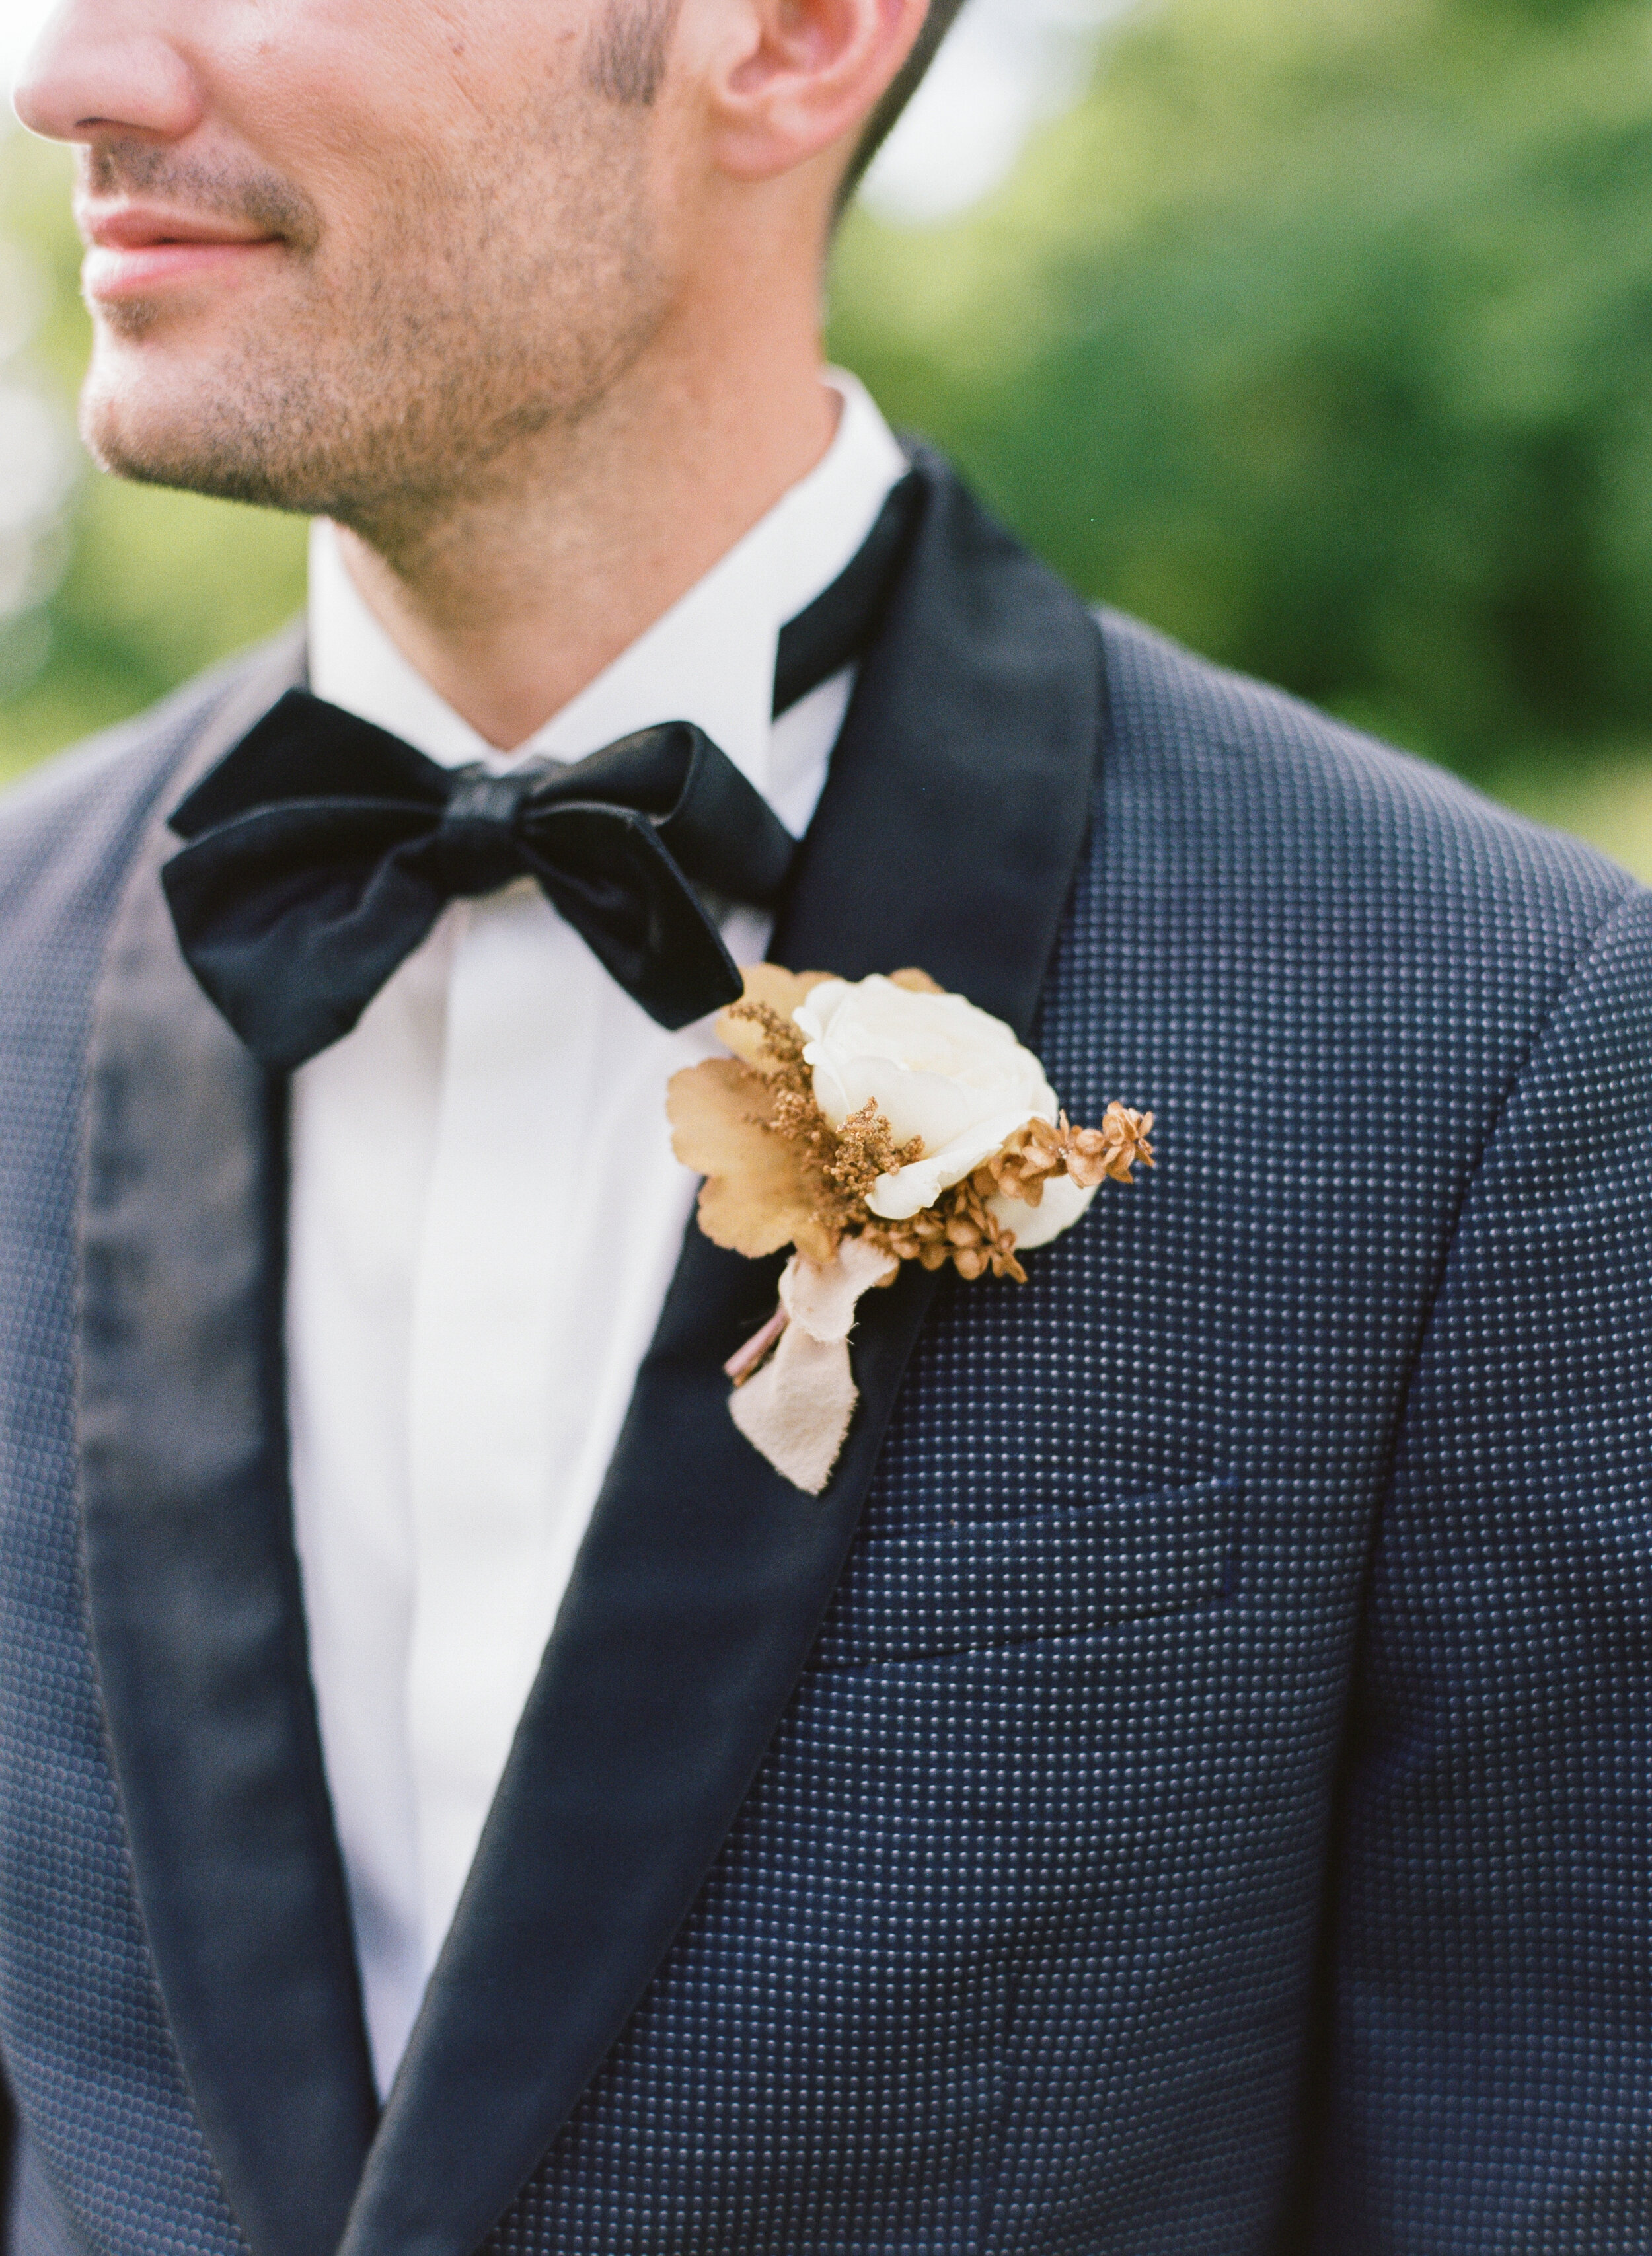 alexandra-meseke-understated-soft-luxury-wedding-upstate-ny_0088.jpg